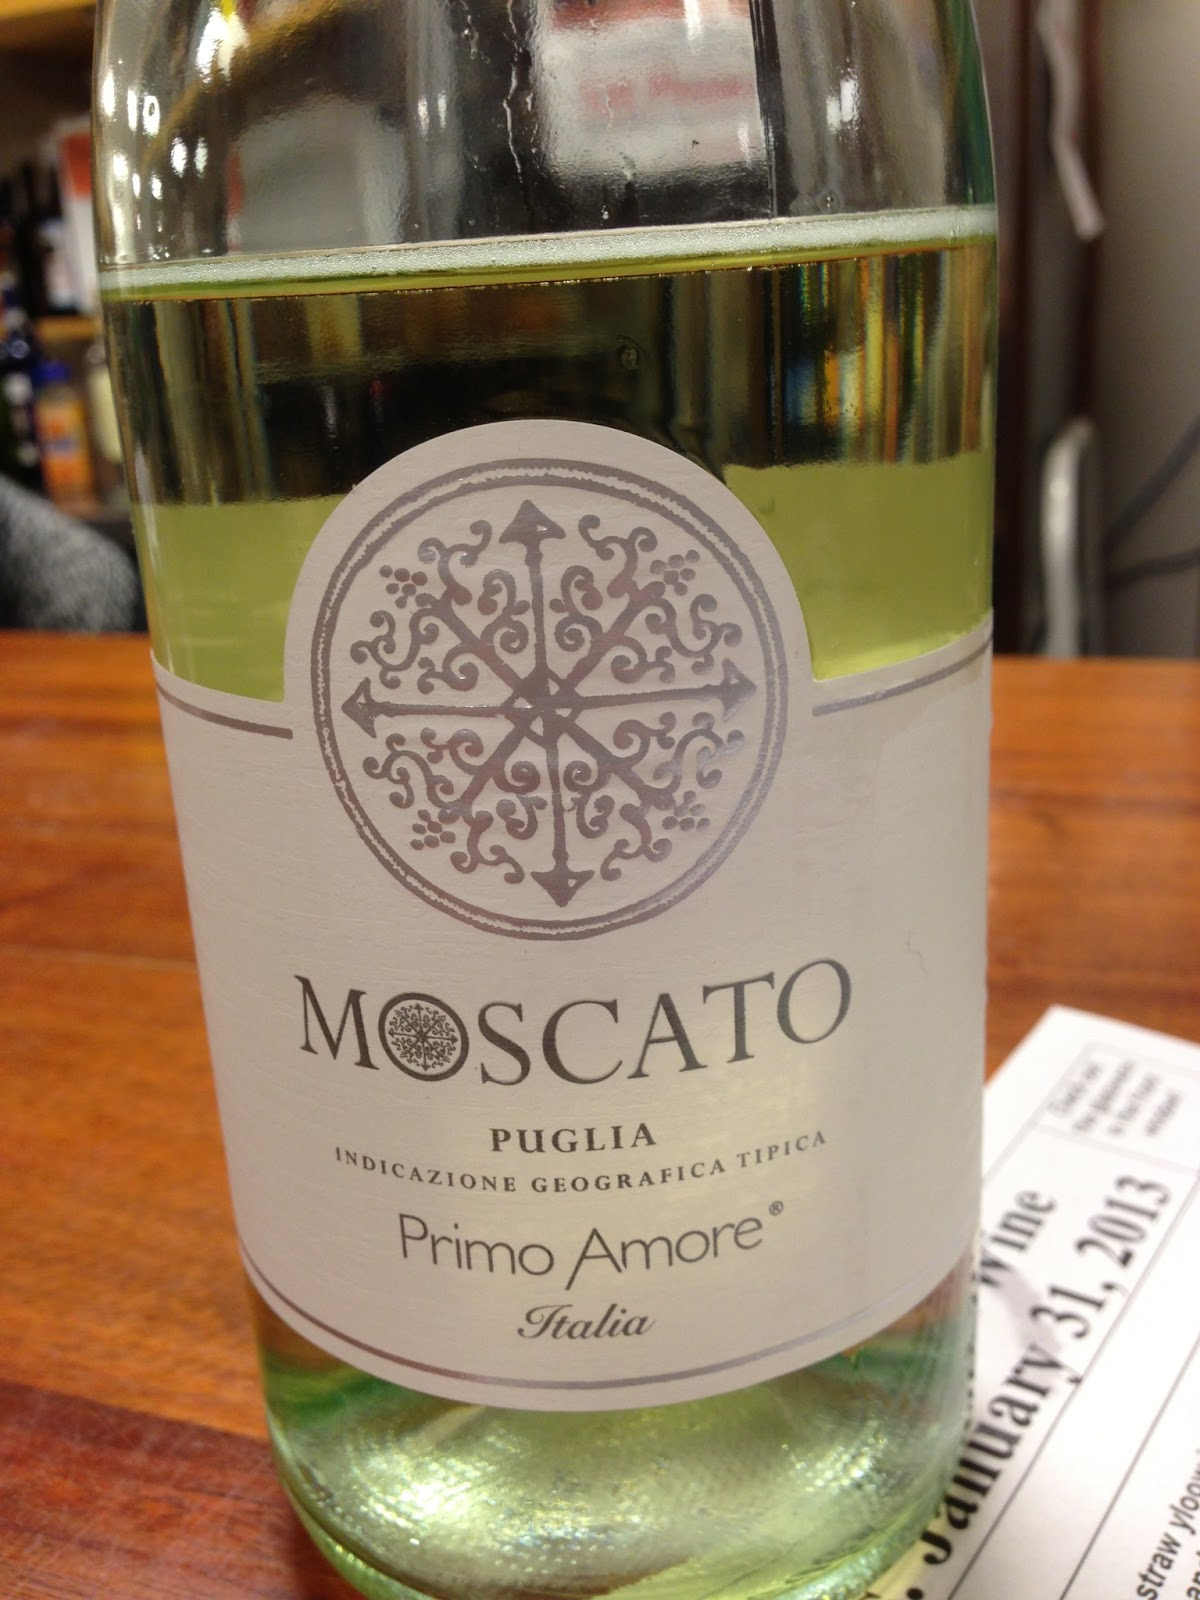 Michael sadowski 39 s wine blog tasting primo amore puglia - Olive garden moscato primo amore ...